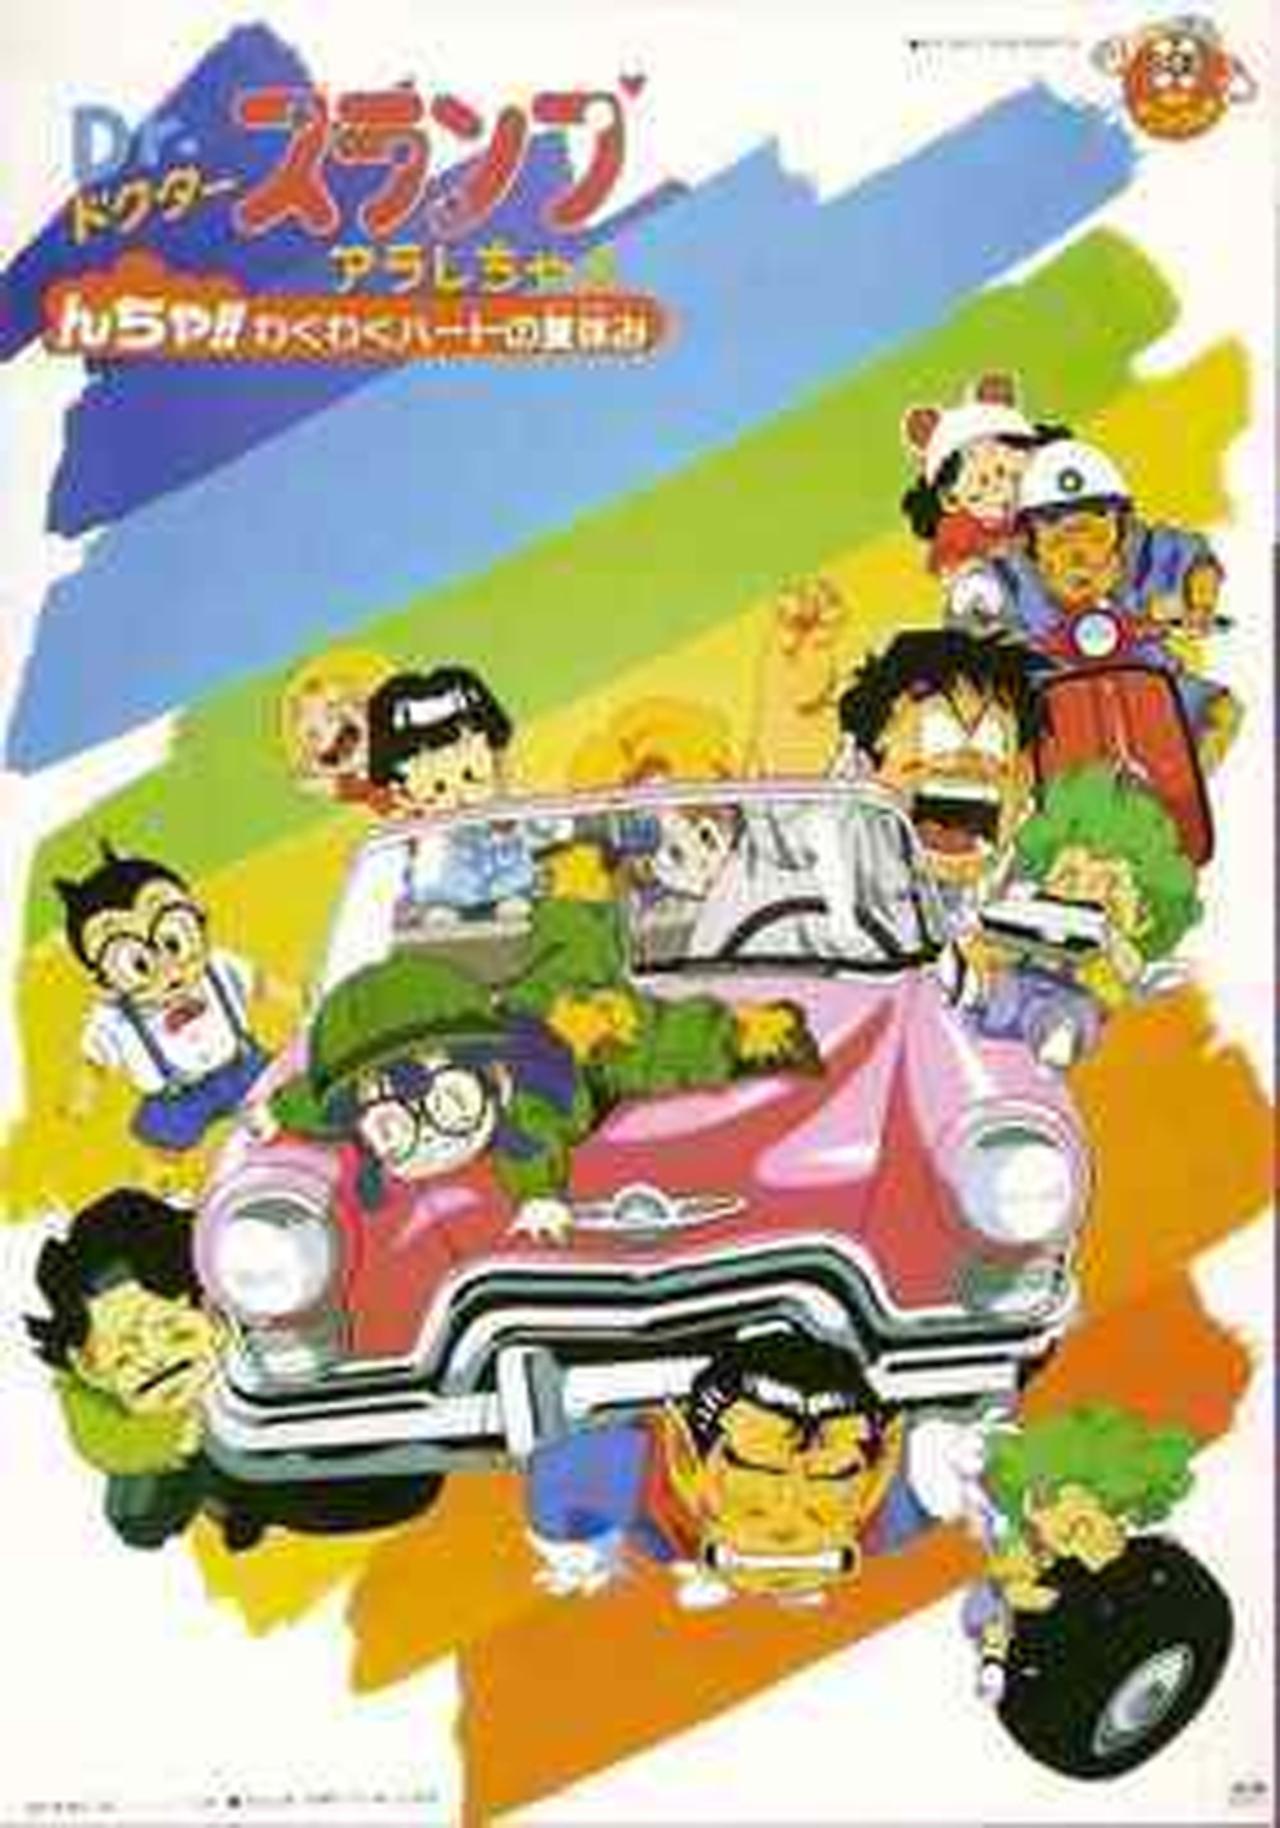 Dr. Slump & Arale-chan Ncha! Wakuwaku Hot Natsu Yasumi kapak